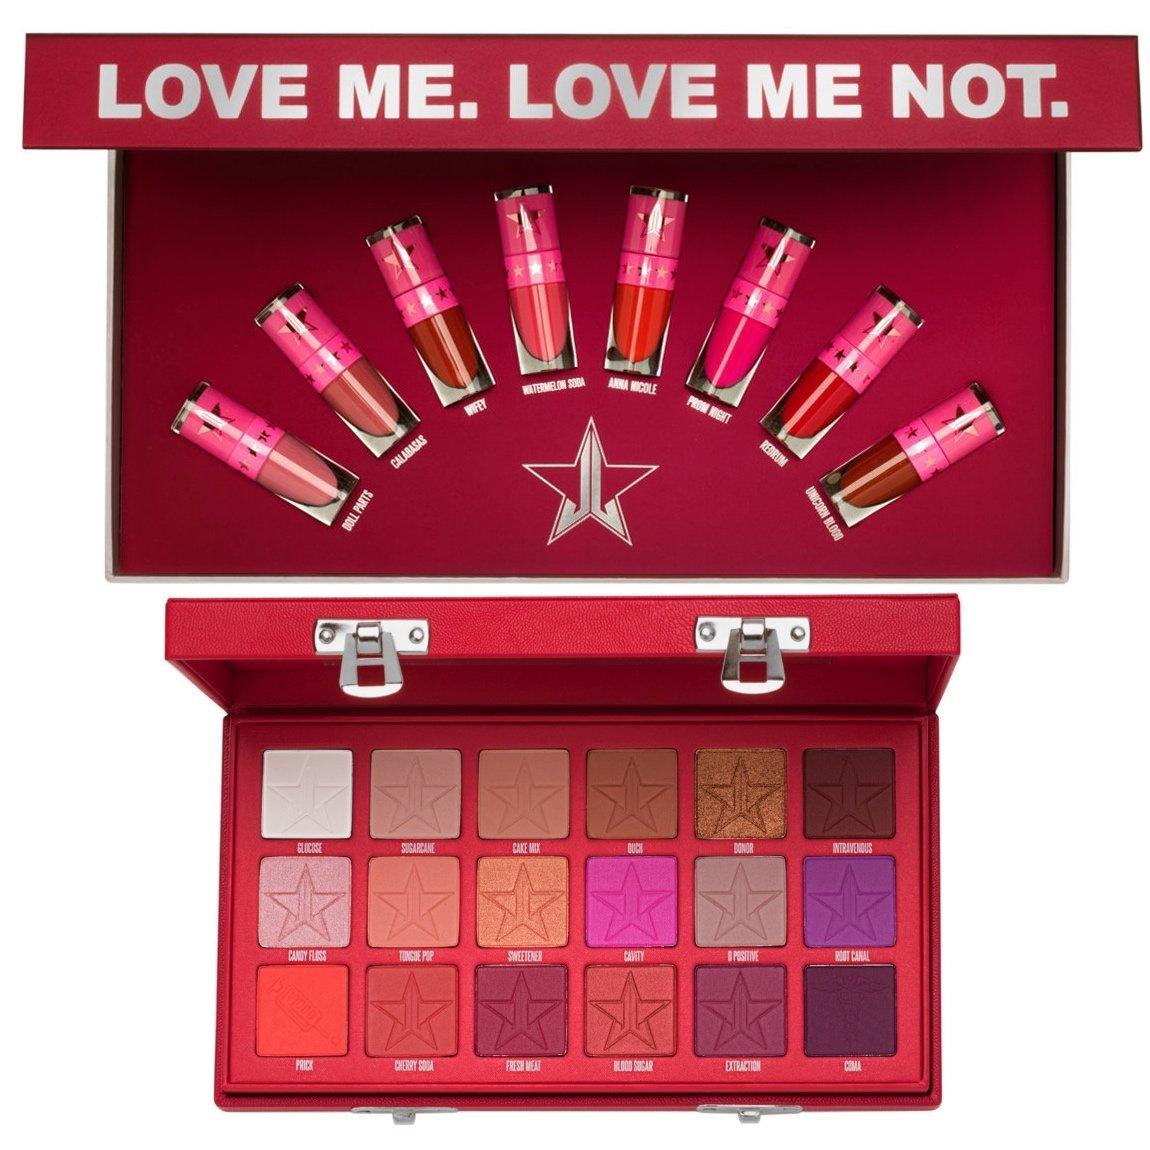 Jeffree Star Cosmetics The Mini Velour Liquid Lipsticks: Reds & Pinks & Blood Sugar Eyeshadow Palette Bundle product swatch.